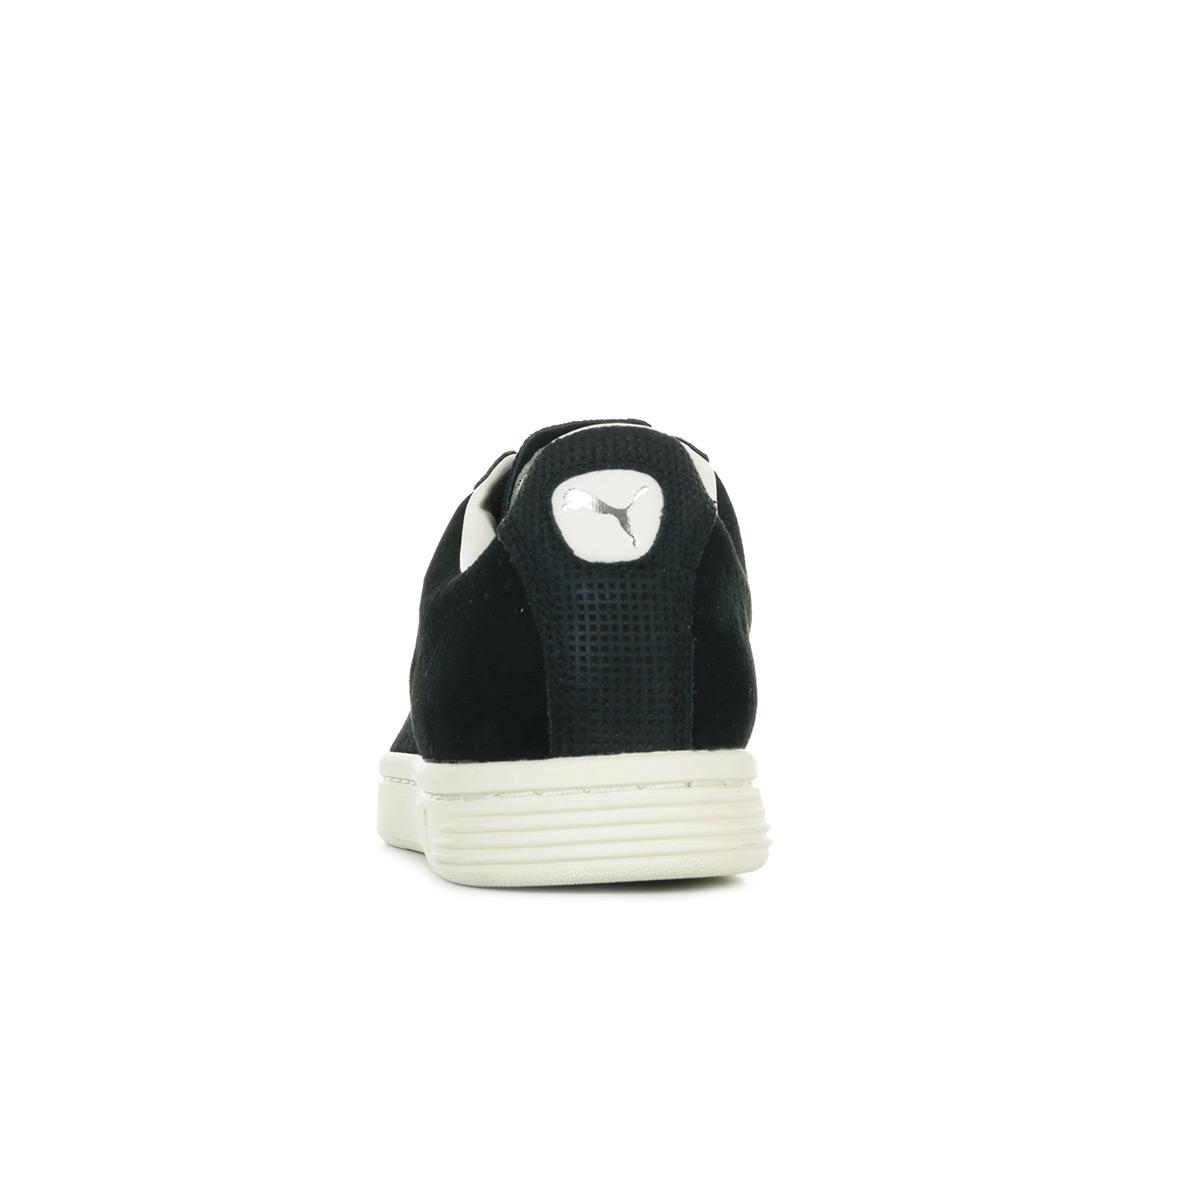 online store 03d05 29c99 Puma Court Star Suede Interest 36661001, Baskets mode homme